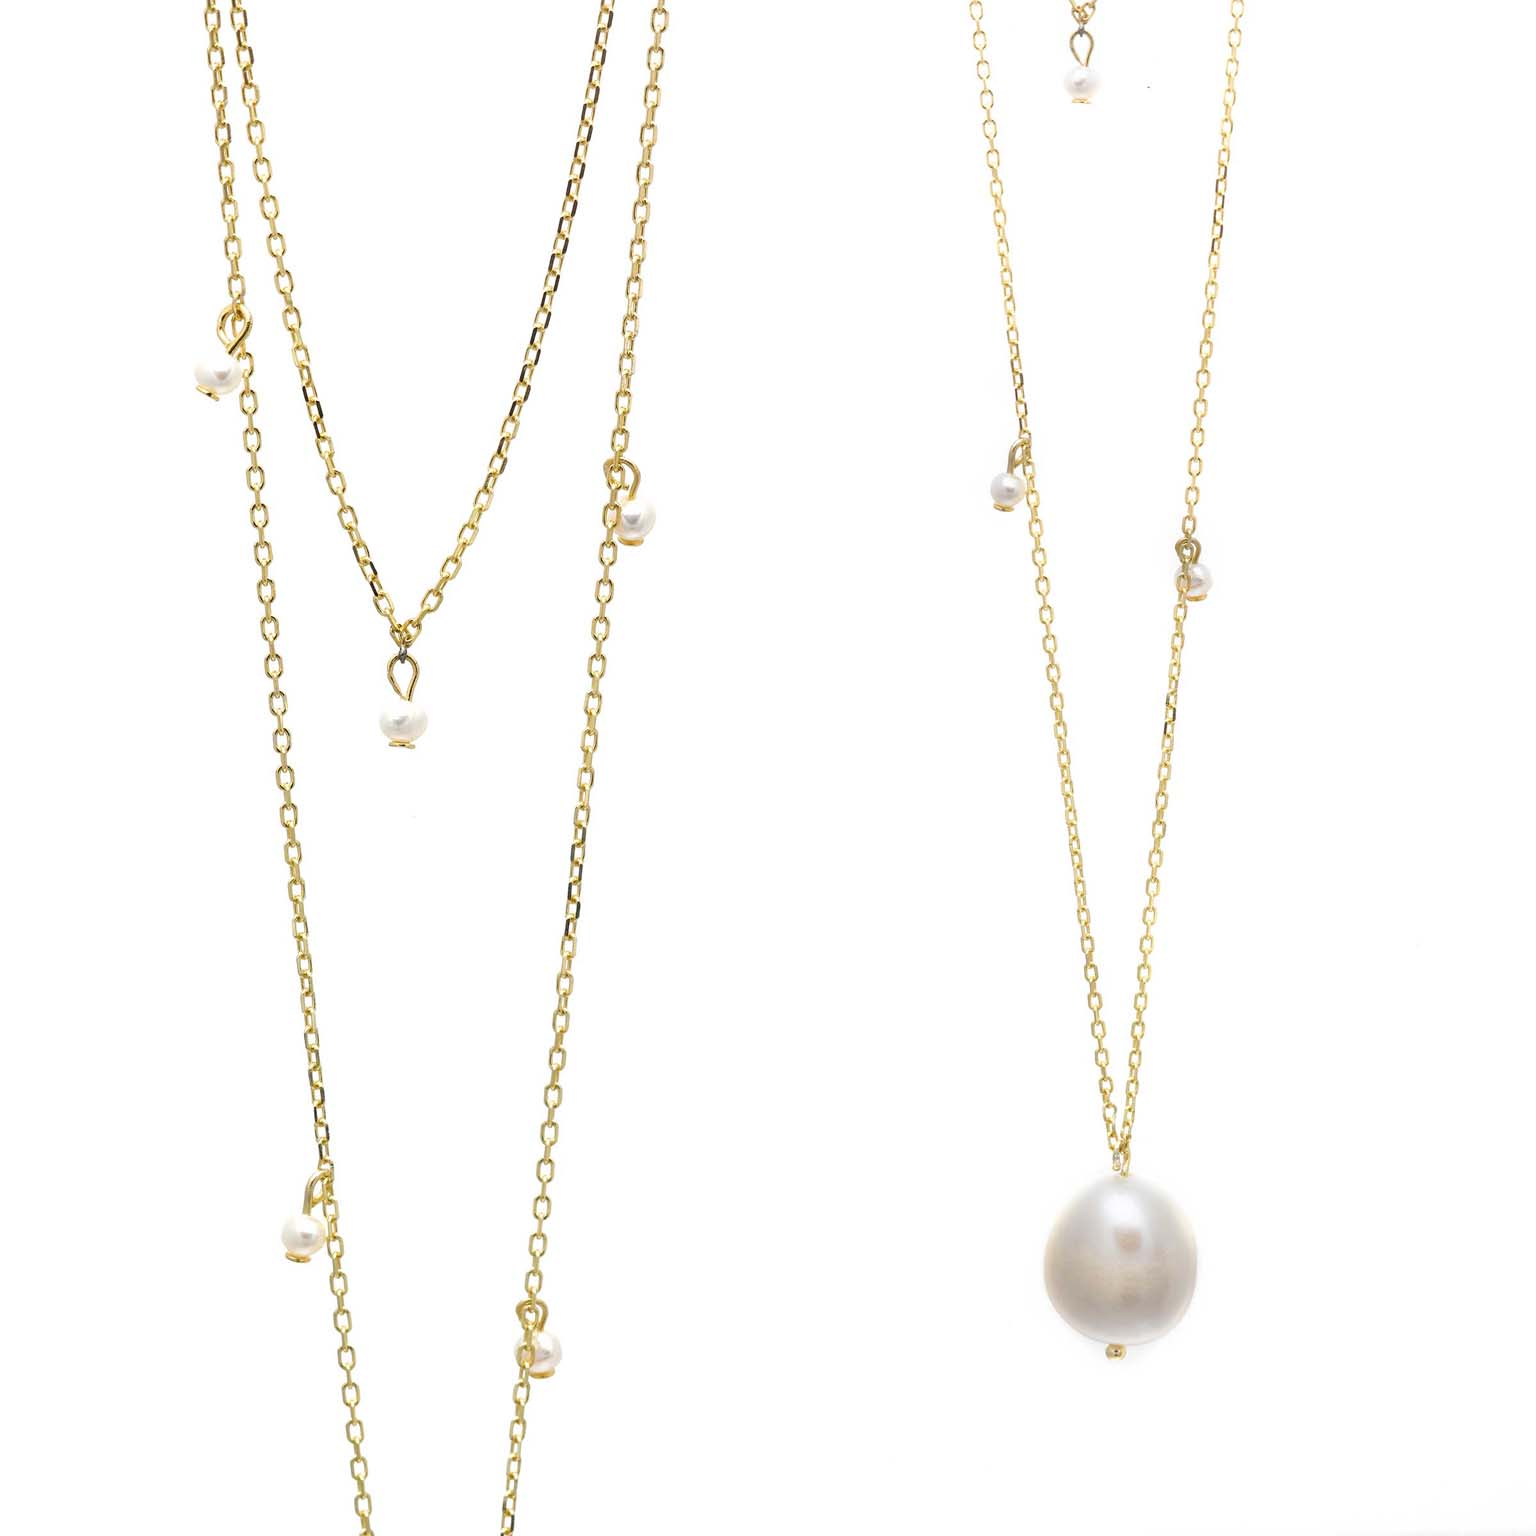 1216a266265a Collar Salvatore Plata doble cadena chapado oro perlas - Joyeria Vila